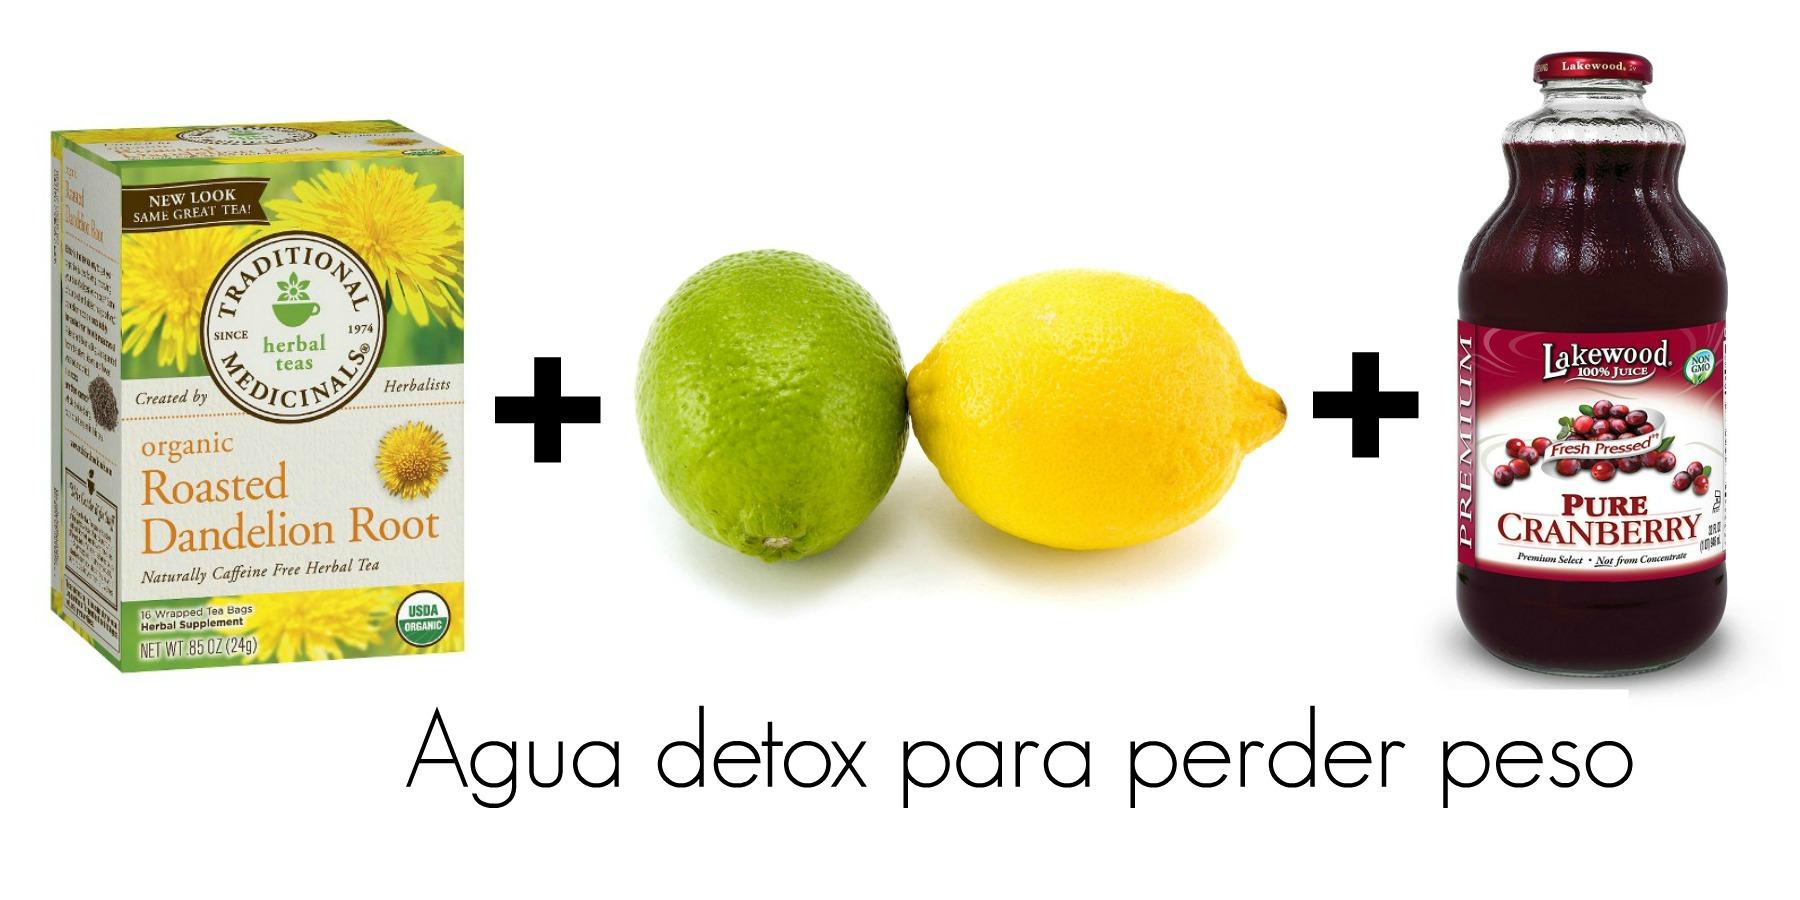 Aguas detox para bajar de peso